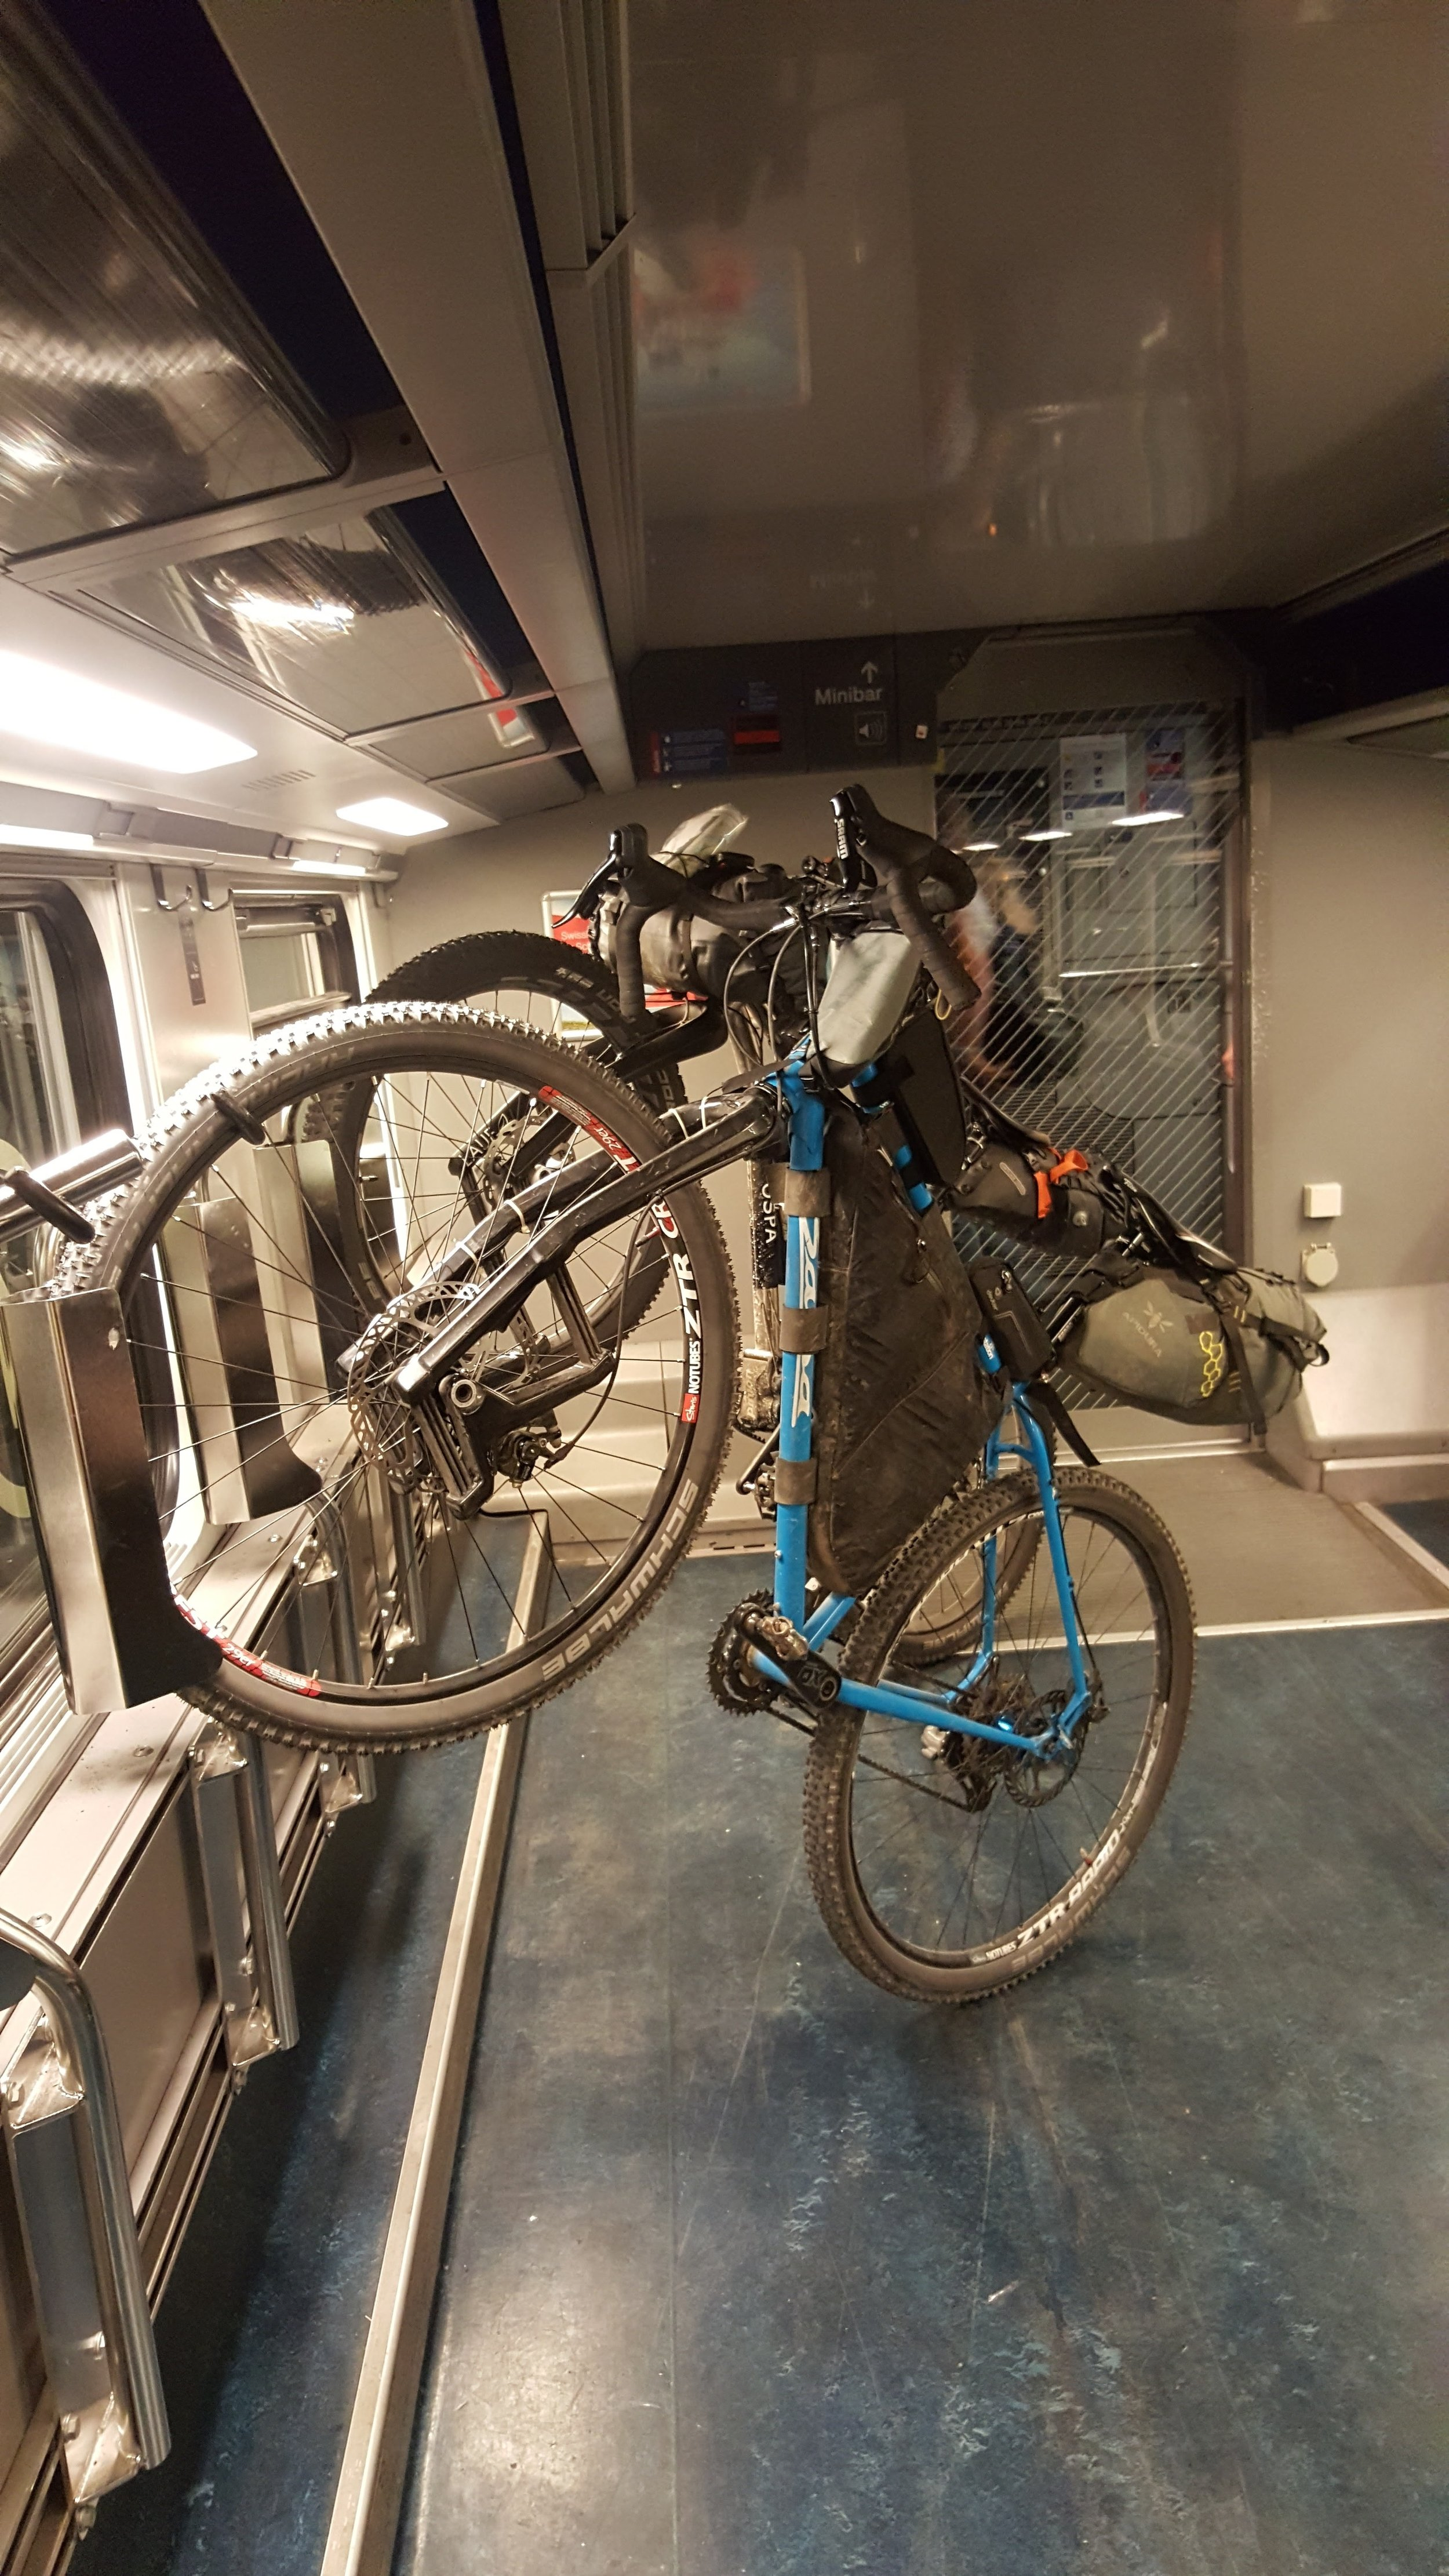 OSPA_Navad1000-travelling-by-train.jpg